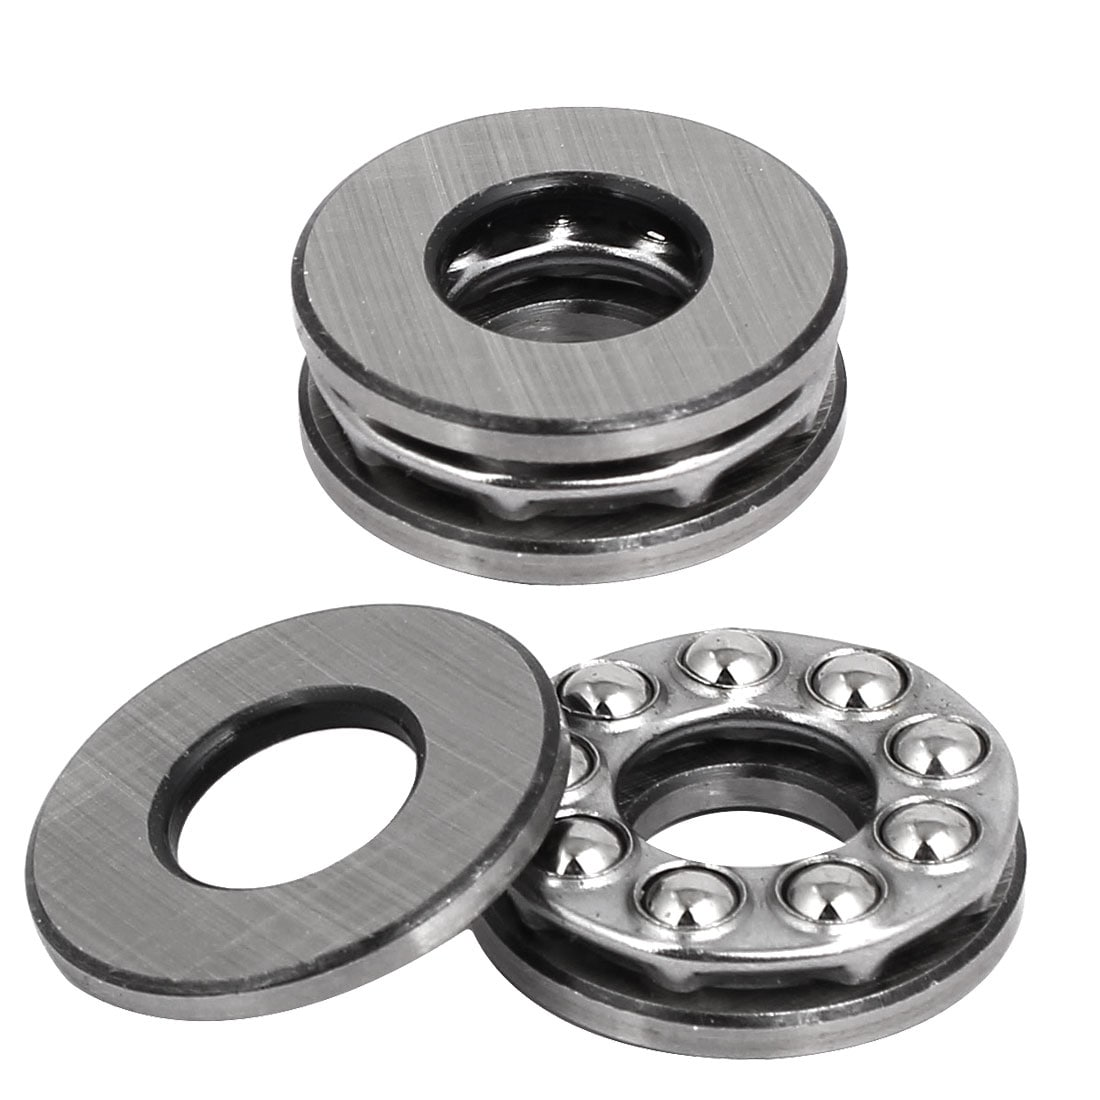 24mmx10mmx9mm Single Row Thrust Ball Bearing Silver Gray 51100 2pcs